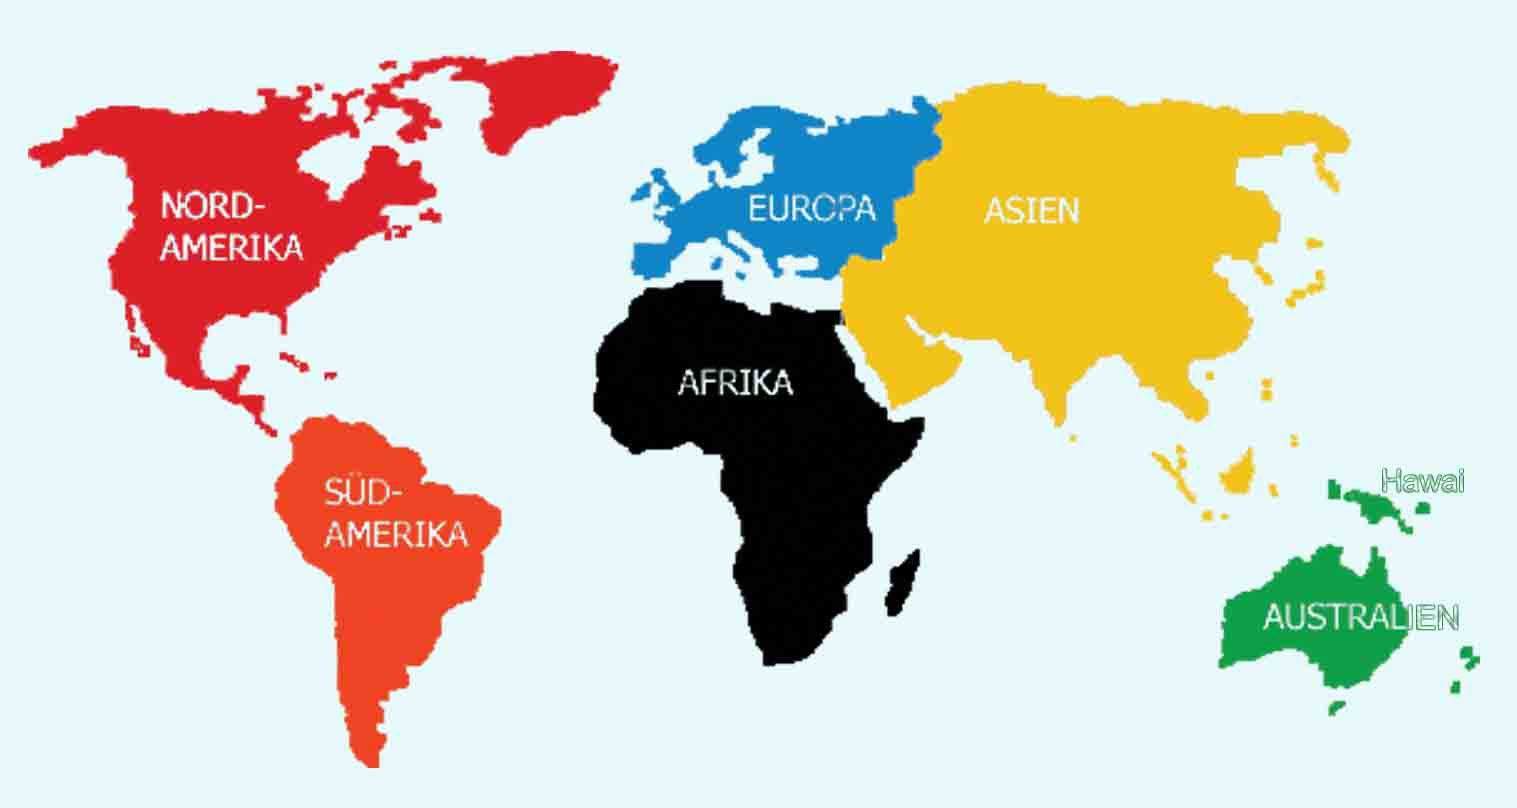 6-kontinente-salze_Kontinente